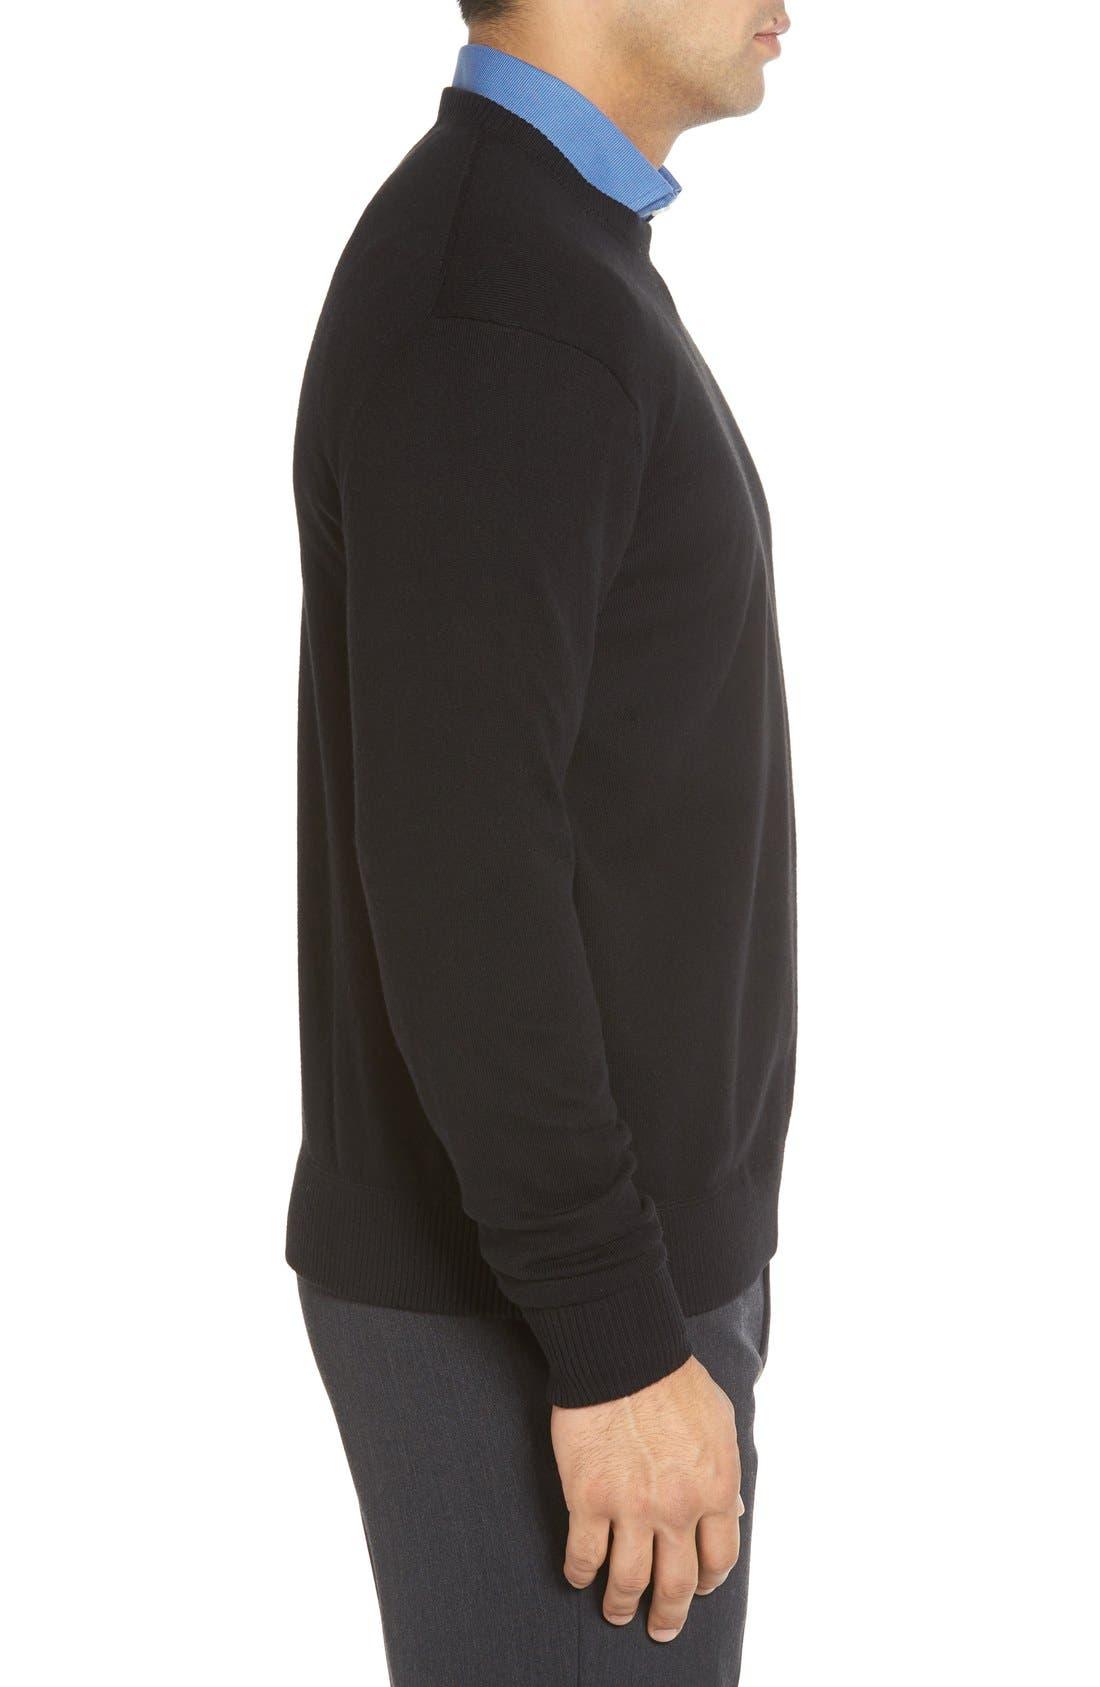 Alternate Image 3  - Robert Talbott 'Jersey Sport' Cotton Blend Crewneck Sweater